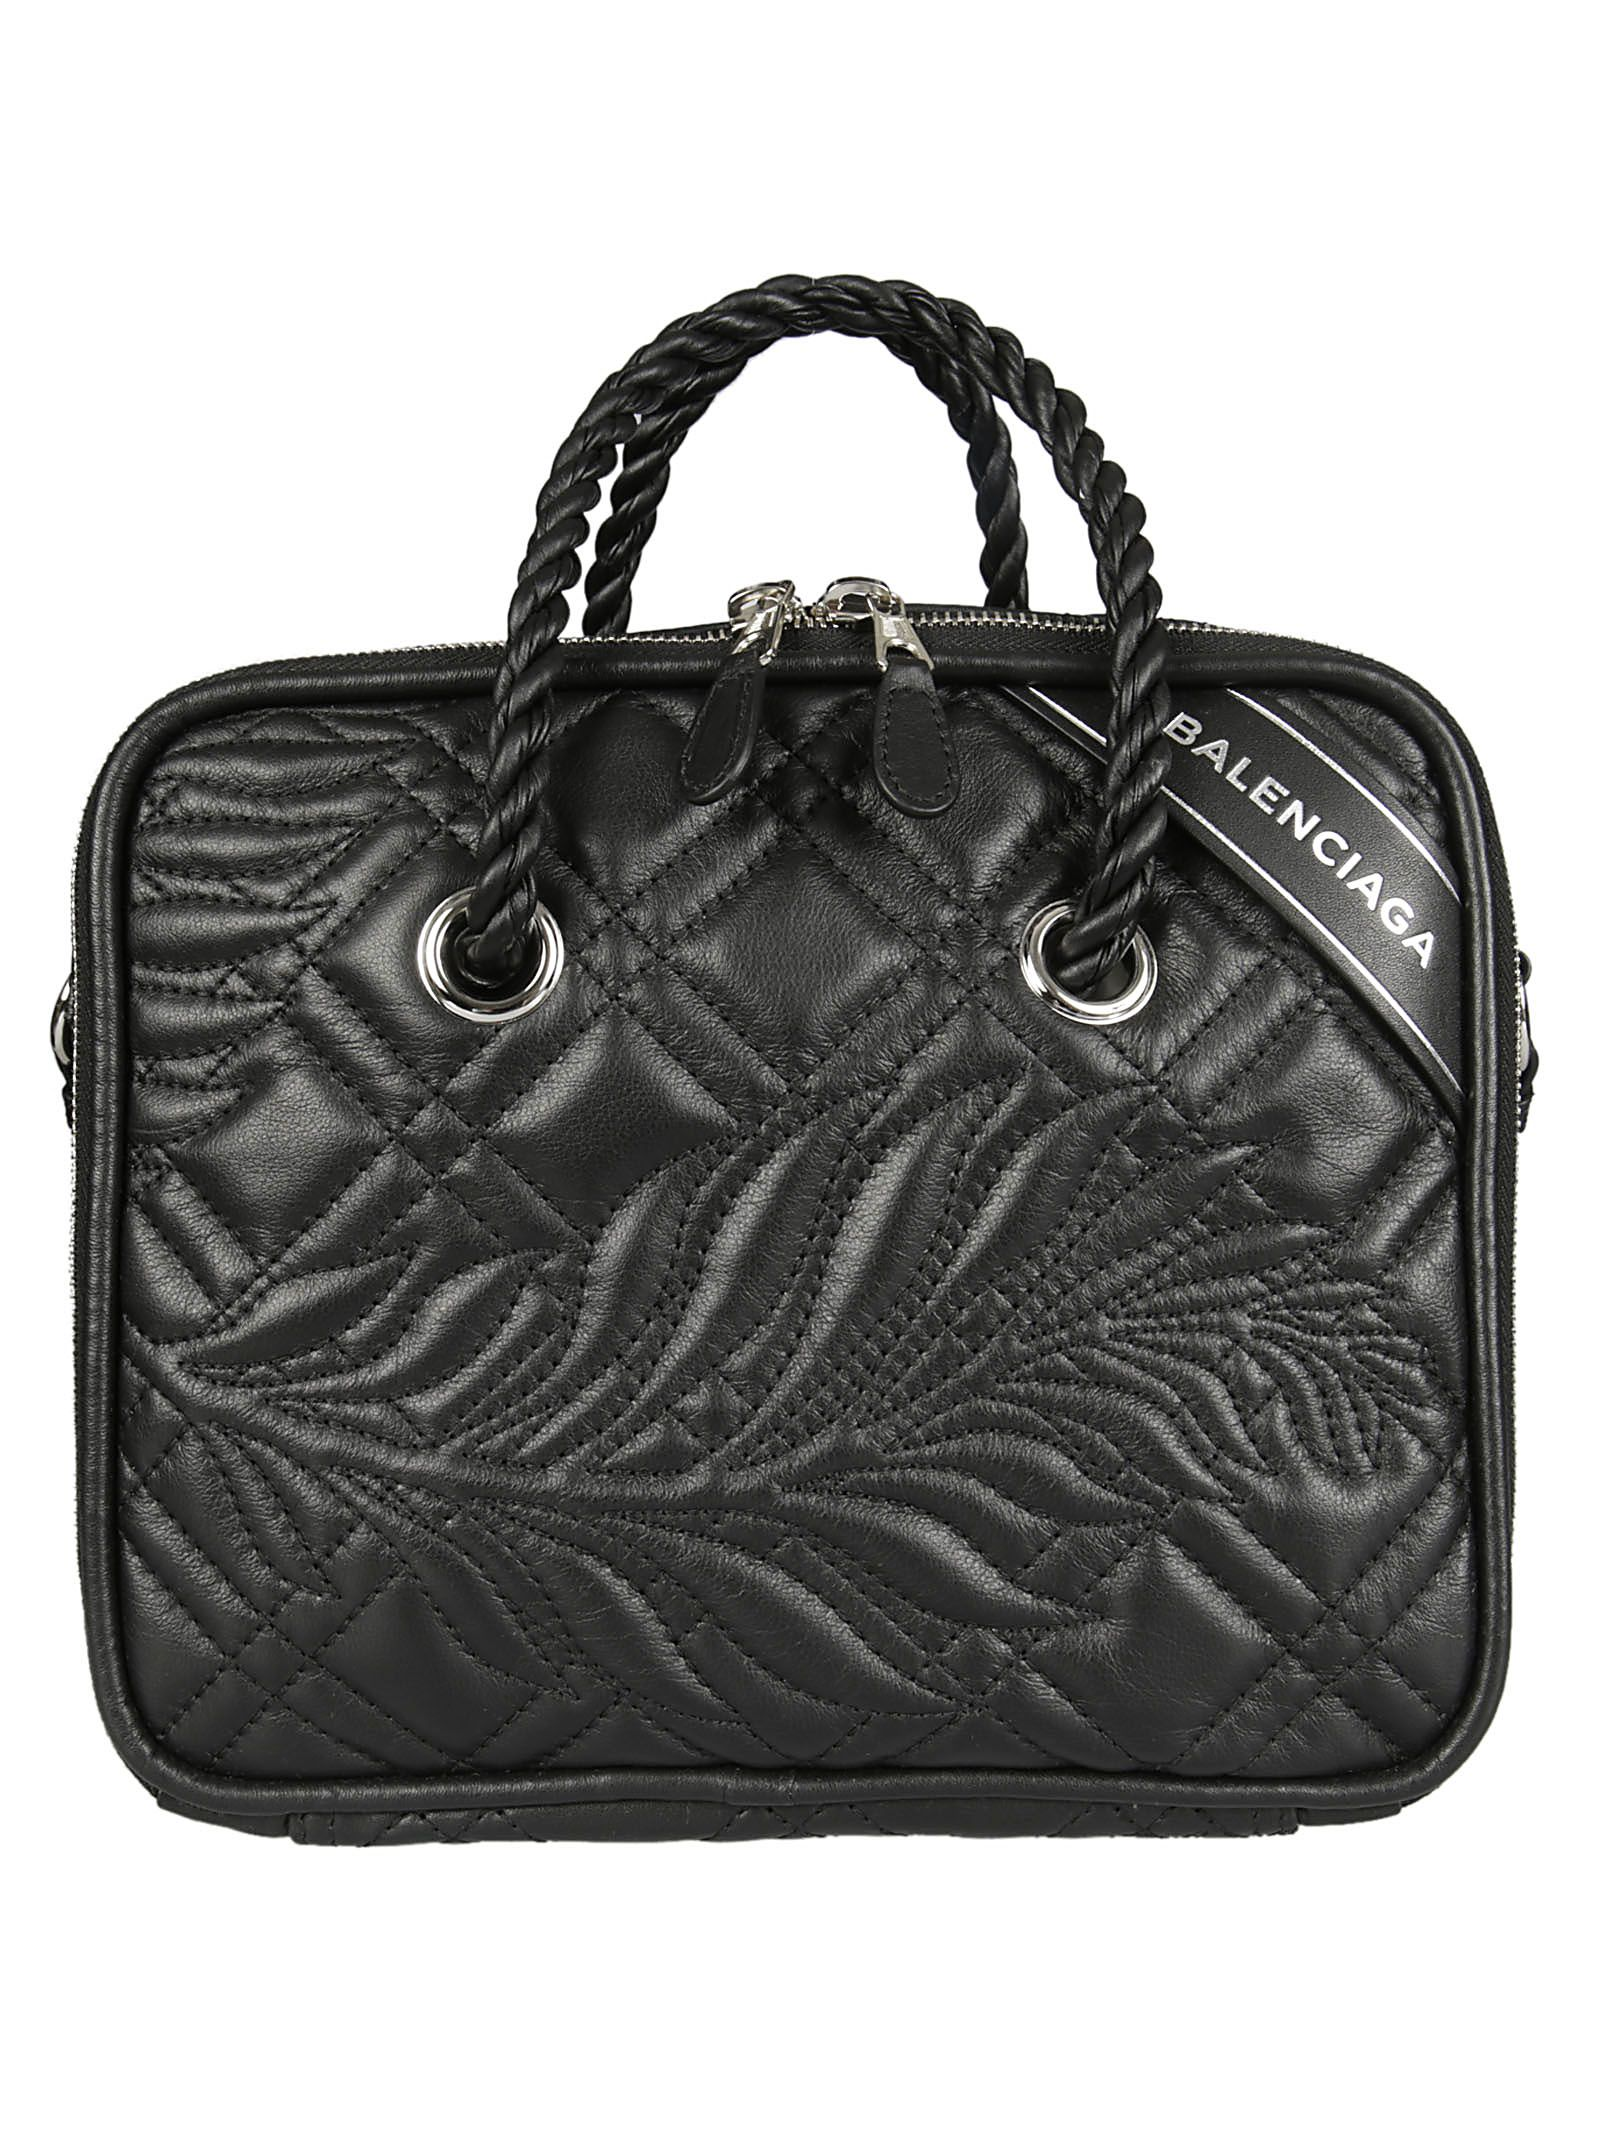 Balenciaga - Balenciaga Blanket Square Shoulder Bag - 466541 D5K1N ...